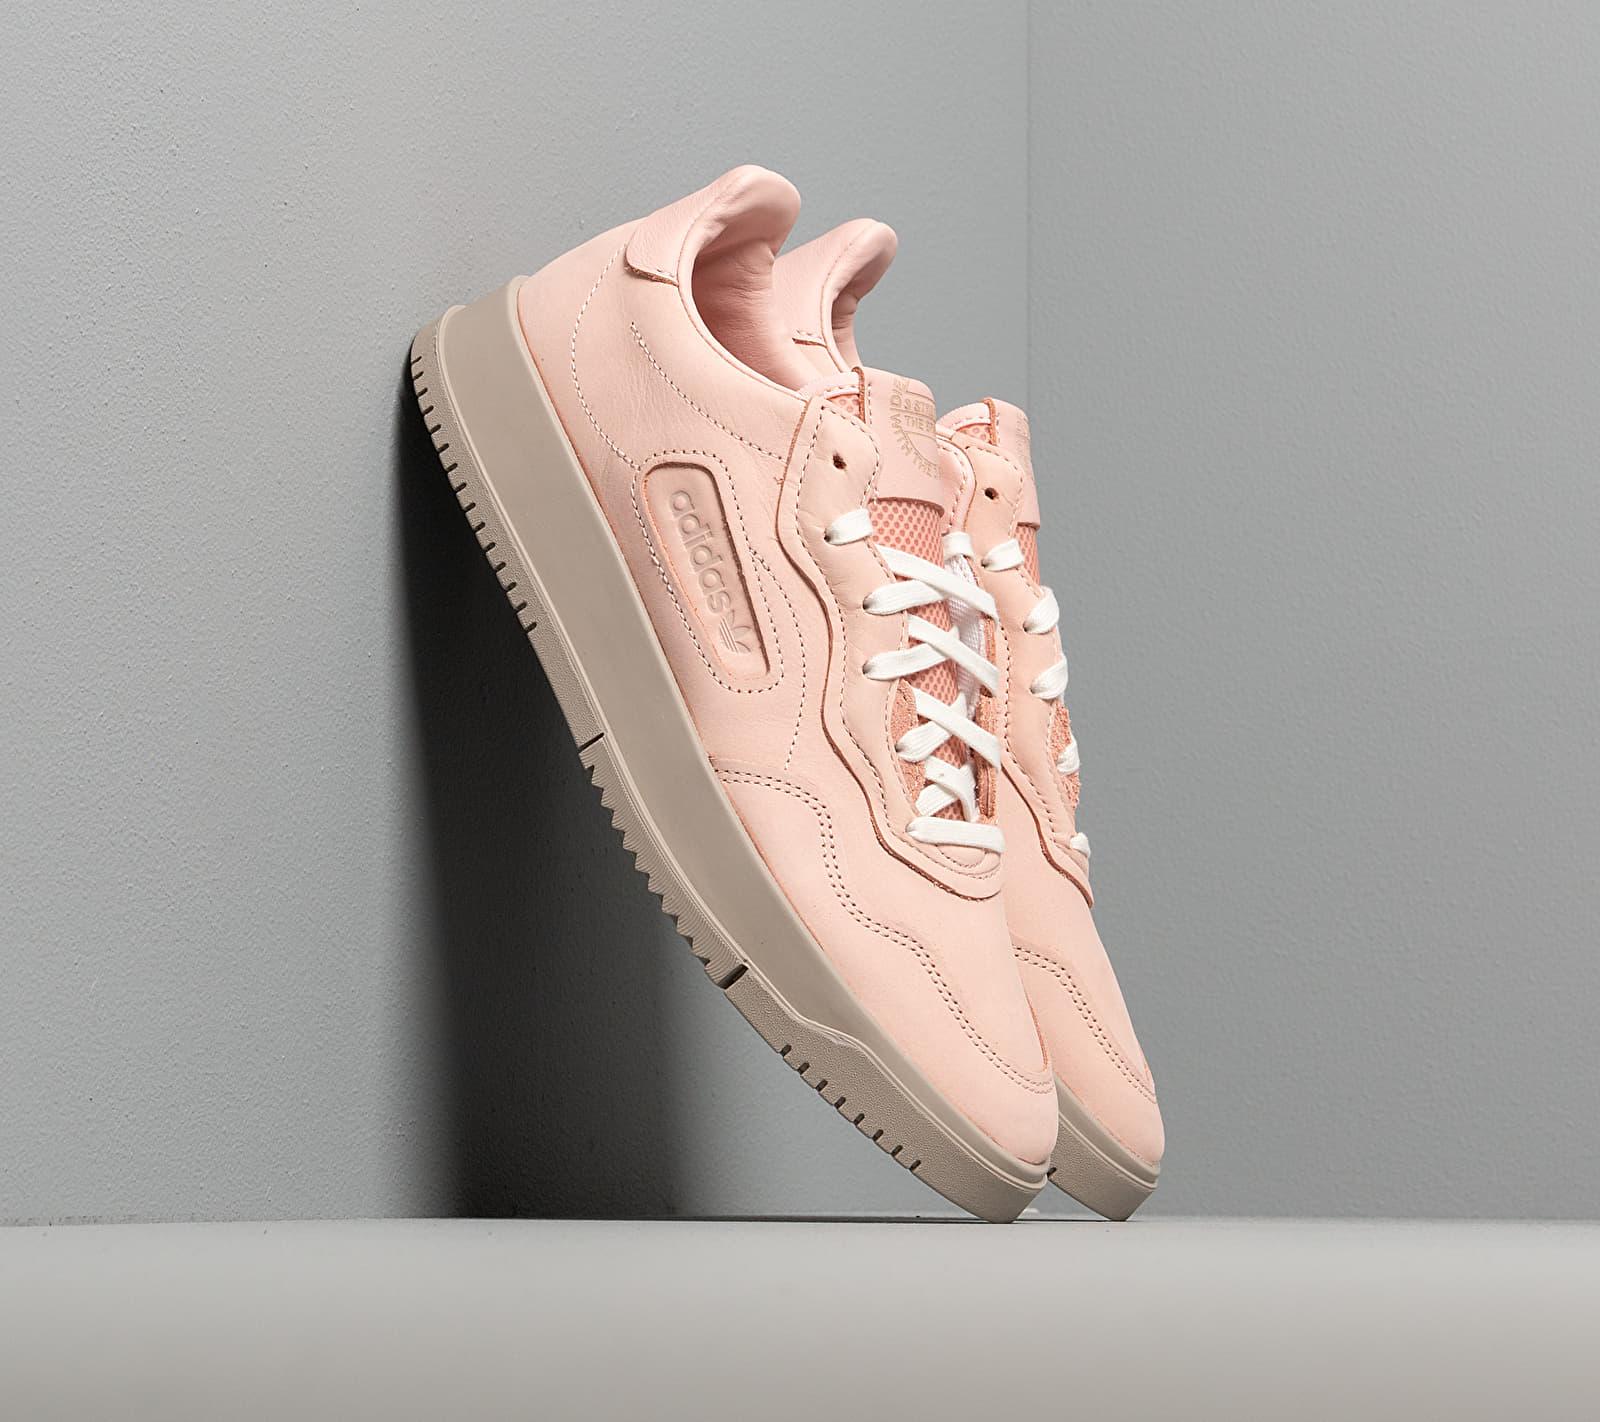 adidas Sc Premiere W Vapor Pink/ Vapor Pink/ Light Brown